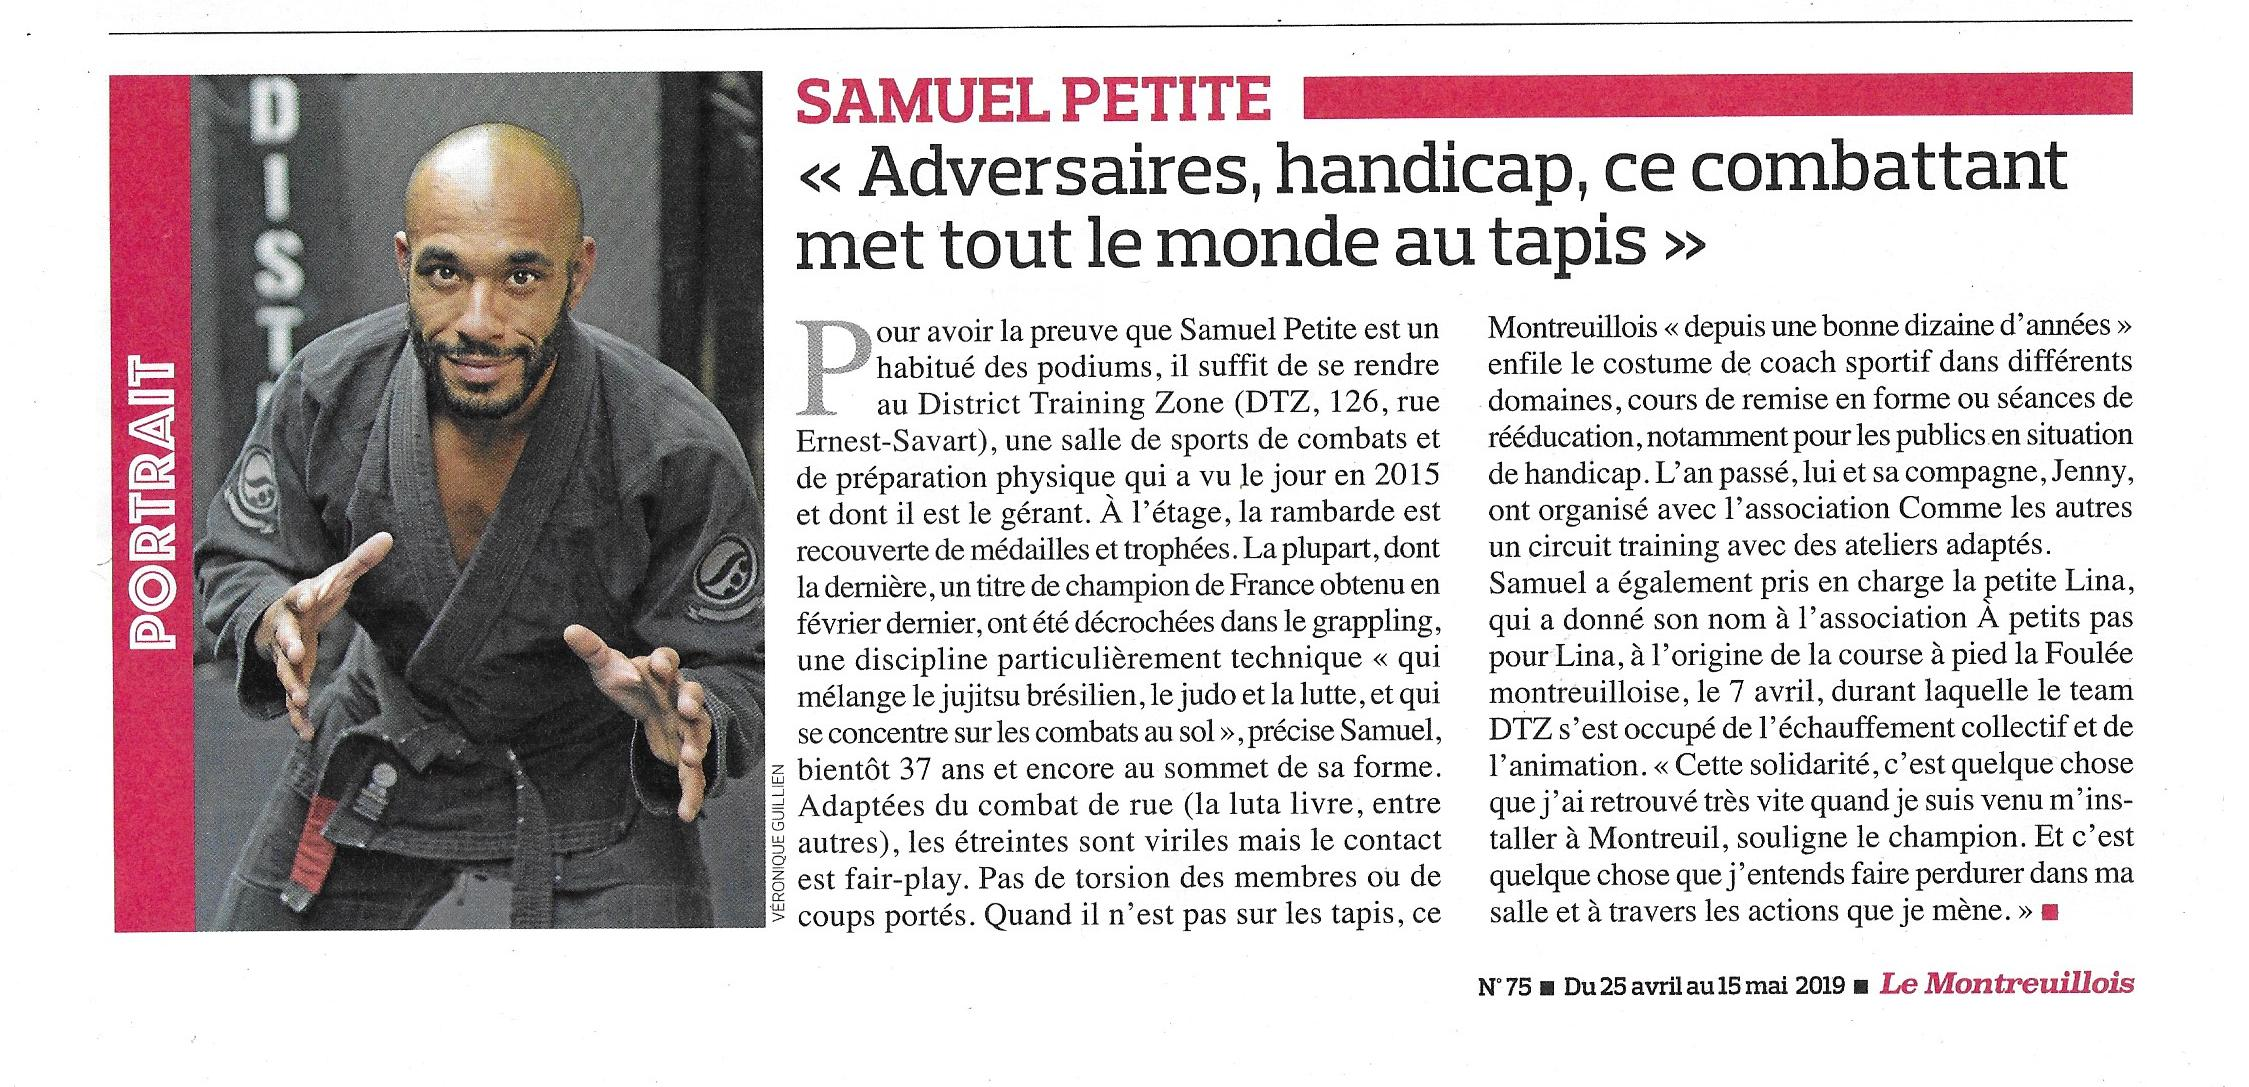 Samuel Petite ARTICLE